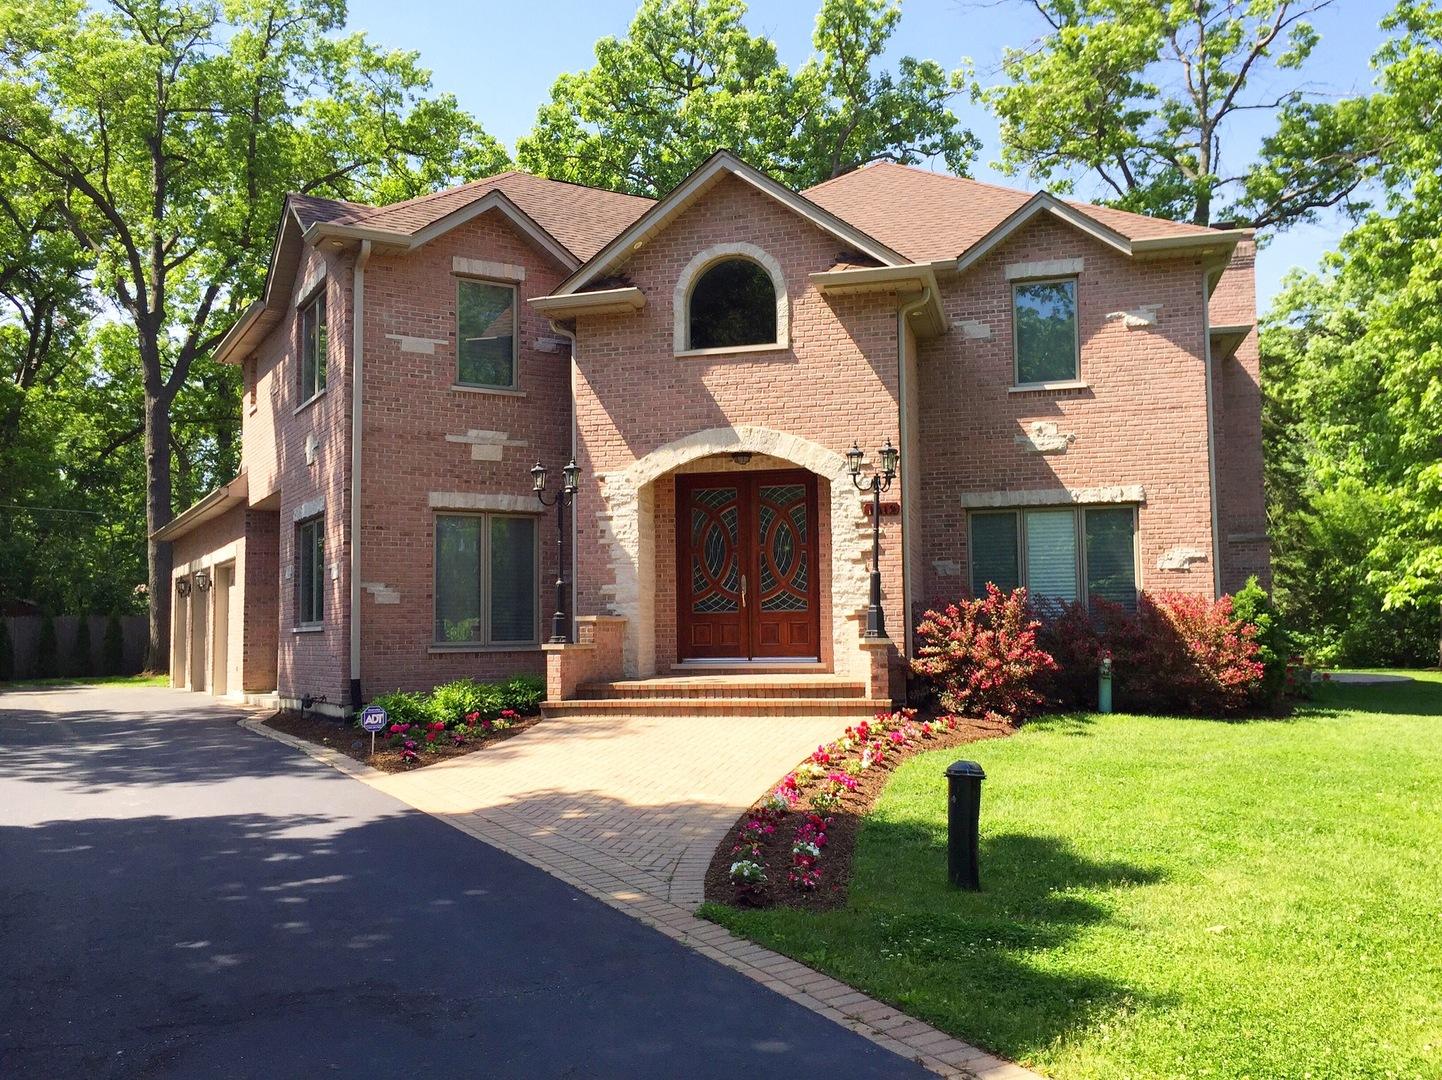 1012 Plaister Avenue, Lake Bluff, Illinois 60044